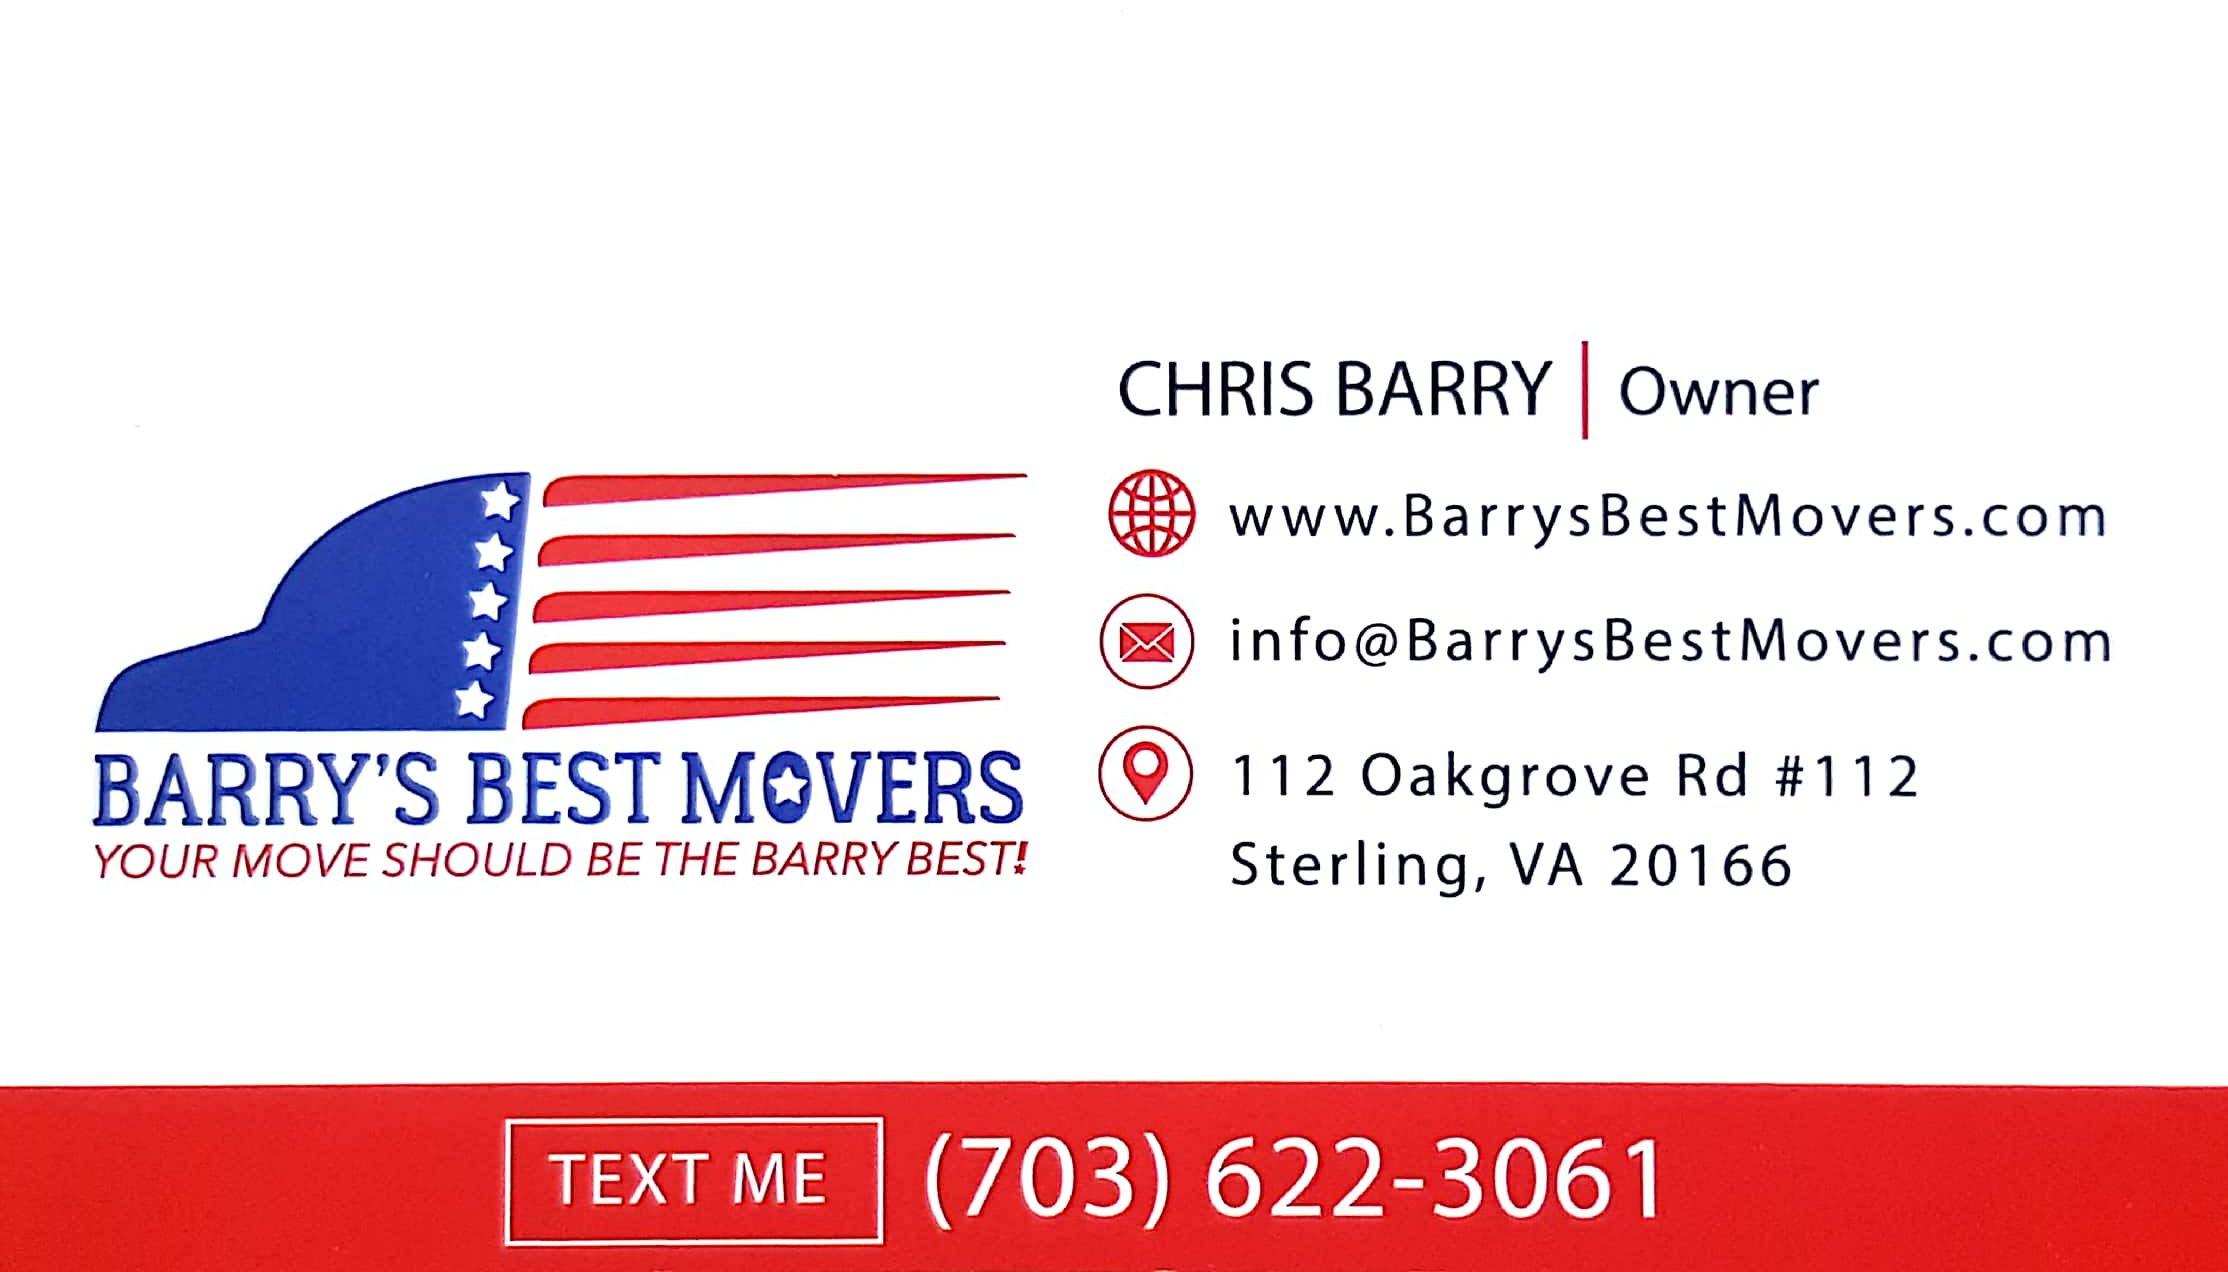 Chris Barry